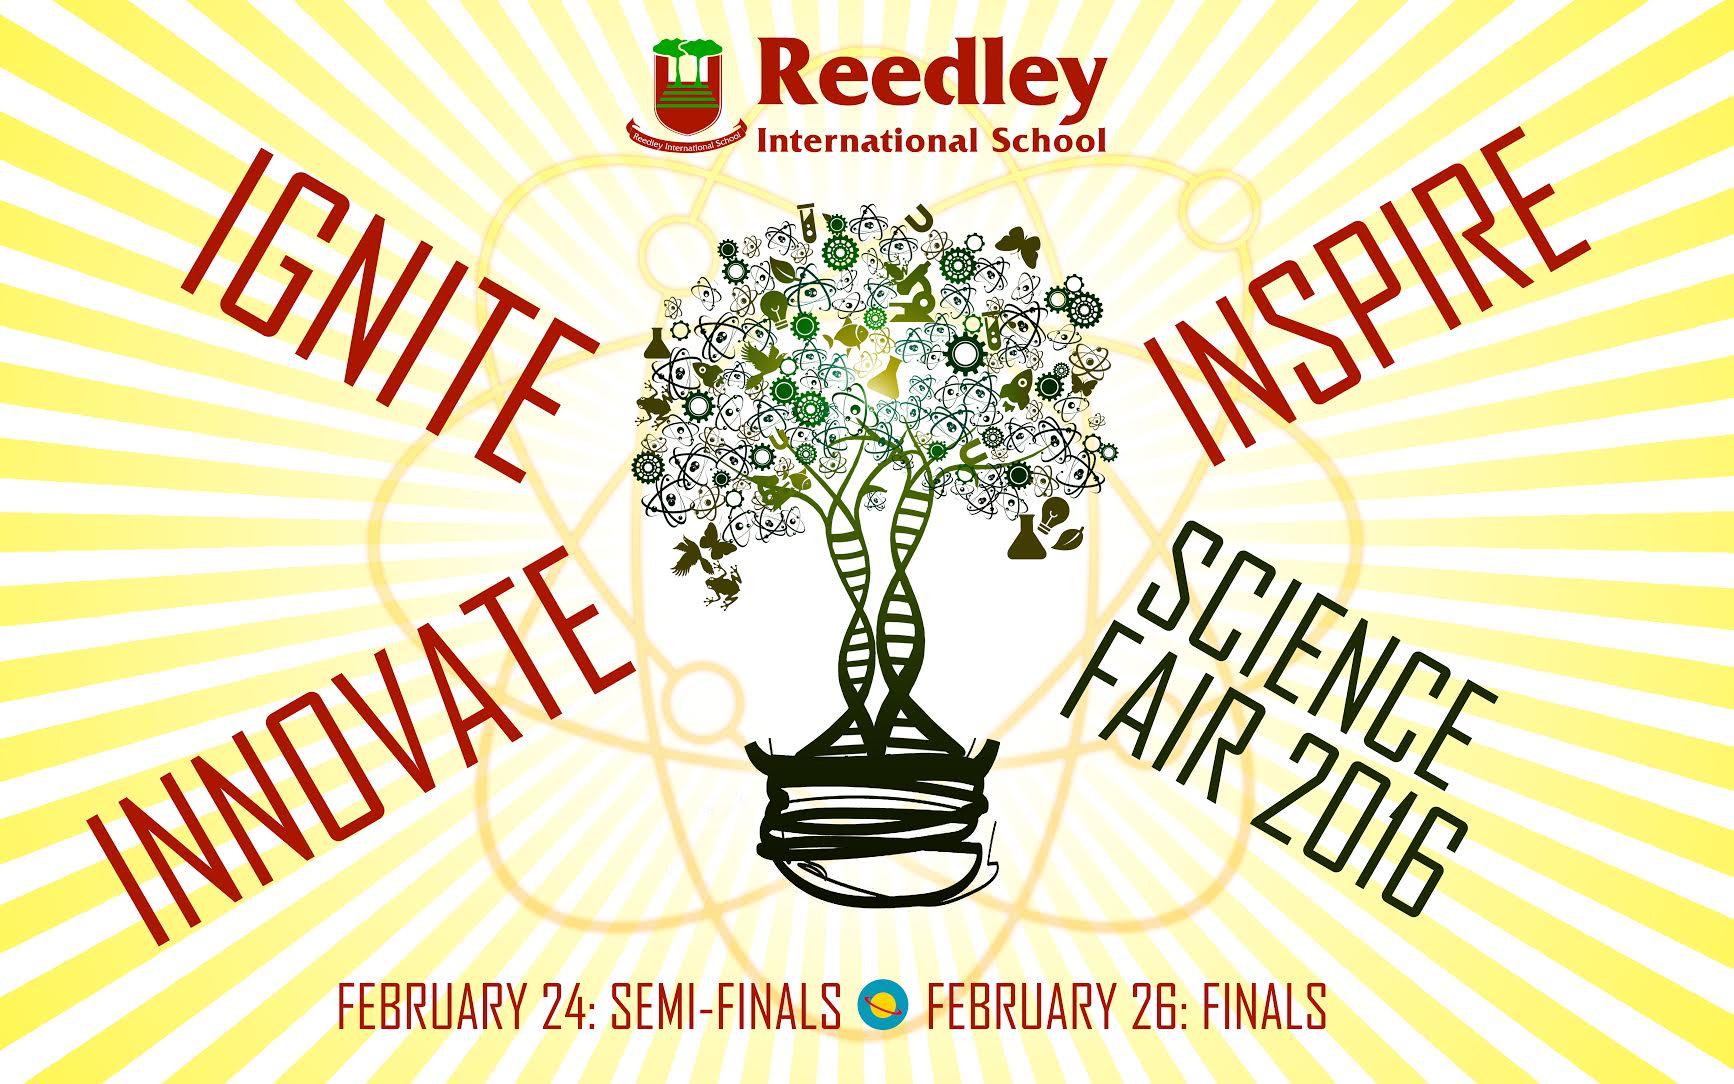 ignite. innovate. inspire.